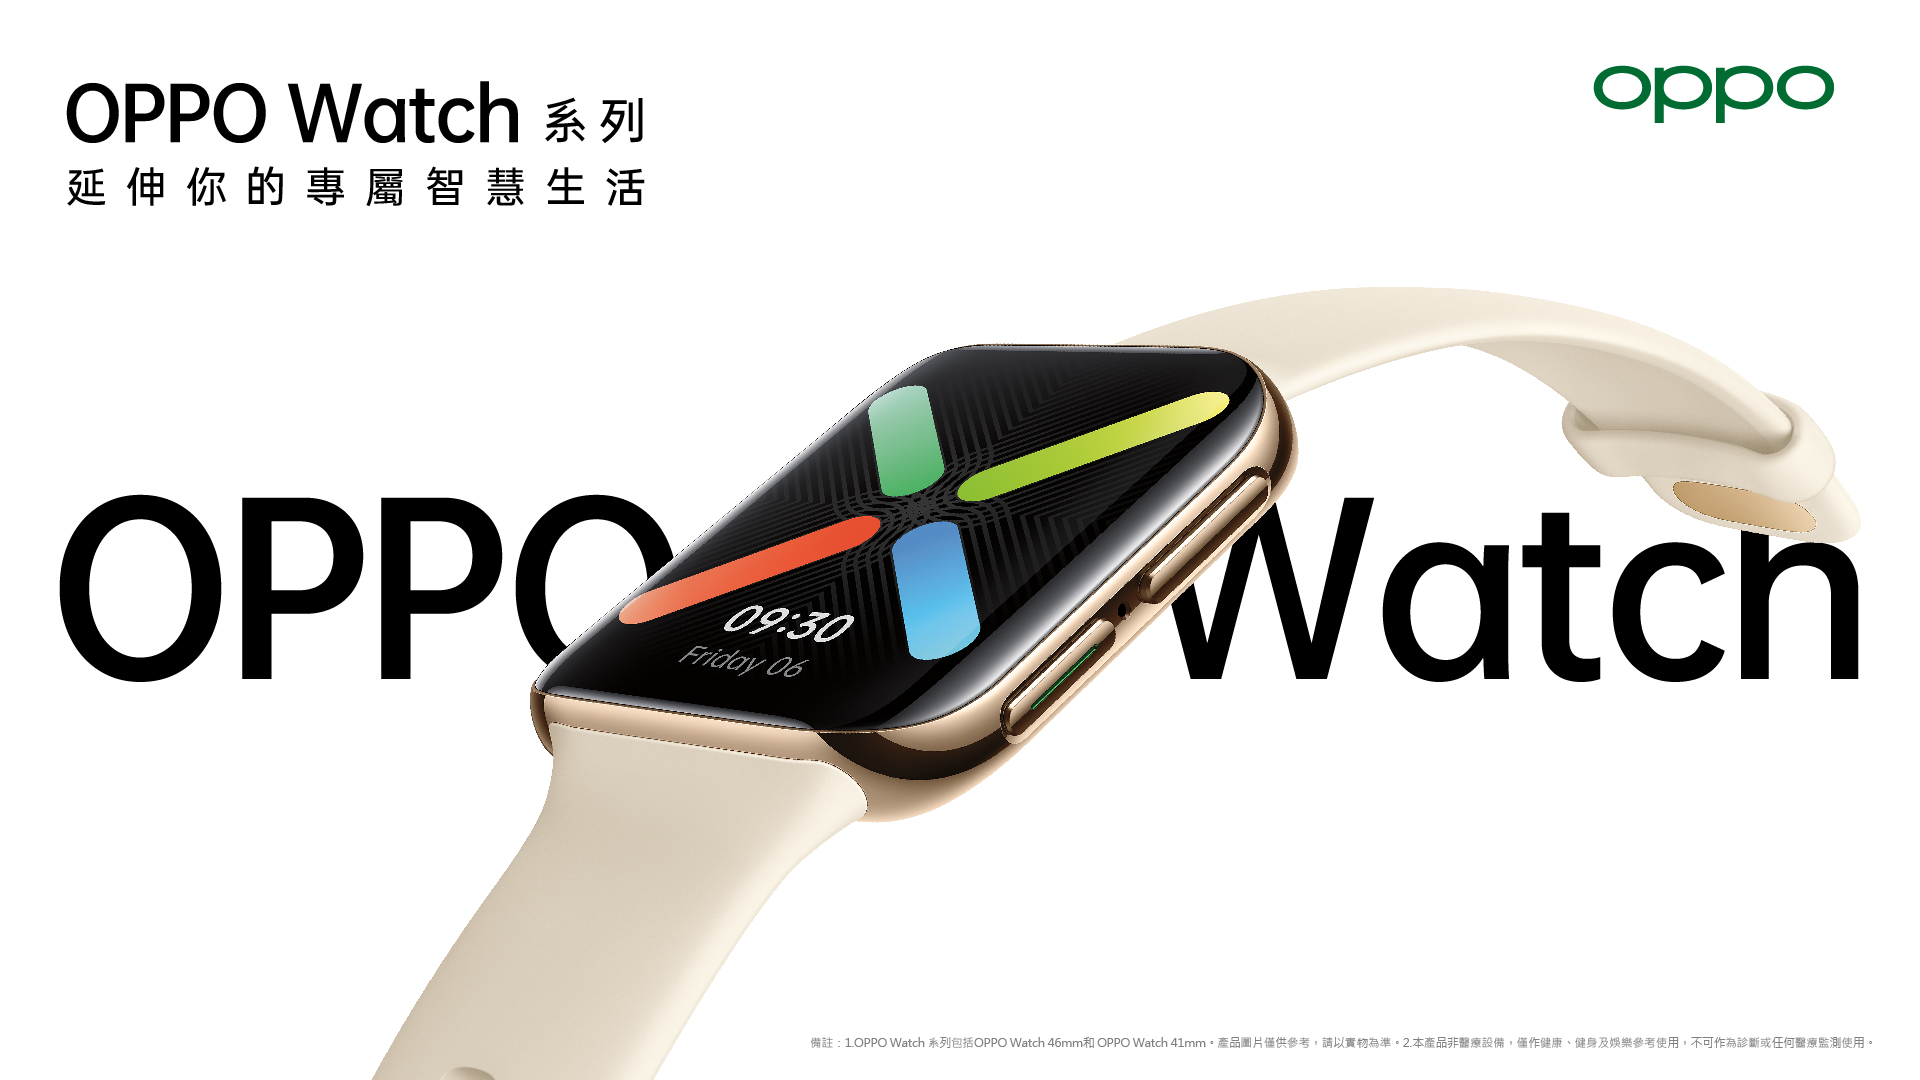 OPPO今(14)日宣布旗下首款搭載Wear OS by Google™的OPPO Watch系列將於8月21日亮眼登場。